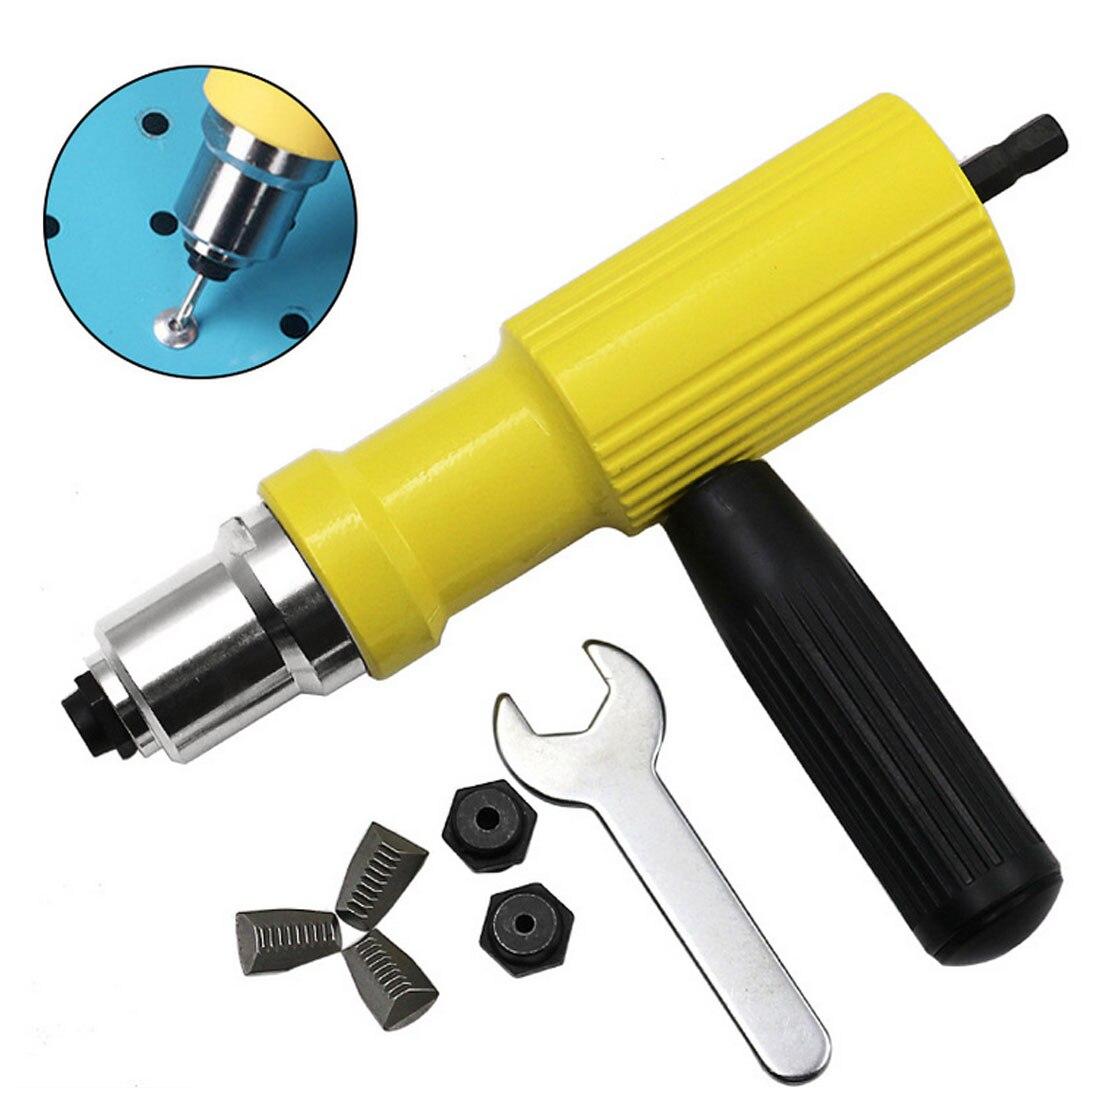 2.4mm-4.8mm Electric Rivet Nut Gun Riveting Tool Cordless Riveting Drill Adaptor Insert Nut Tool Riveting Drill Adapter2.4mm-4.8mm Electric Rivet Nut Gun Riveting Tool Cordless Riveting Drill Adaptor Insert Nut Tool Riveting Drill Adapter